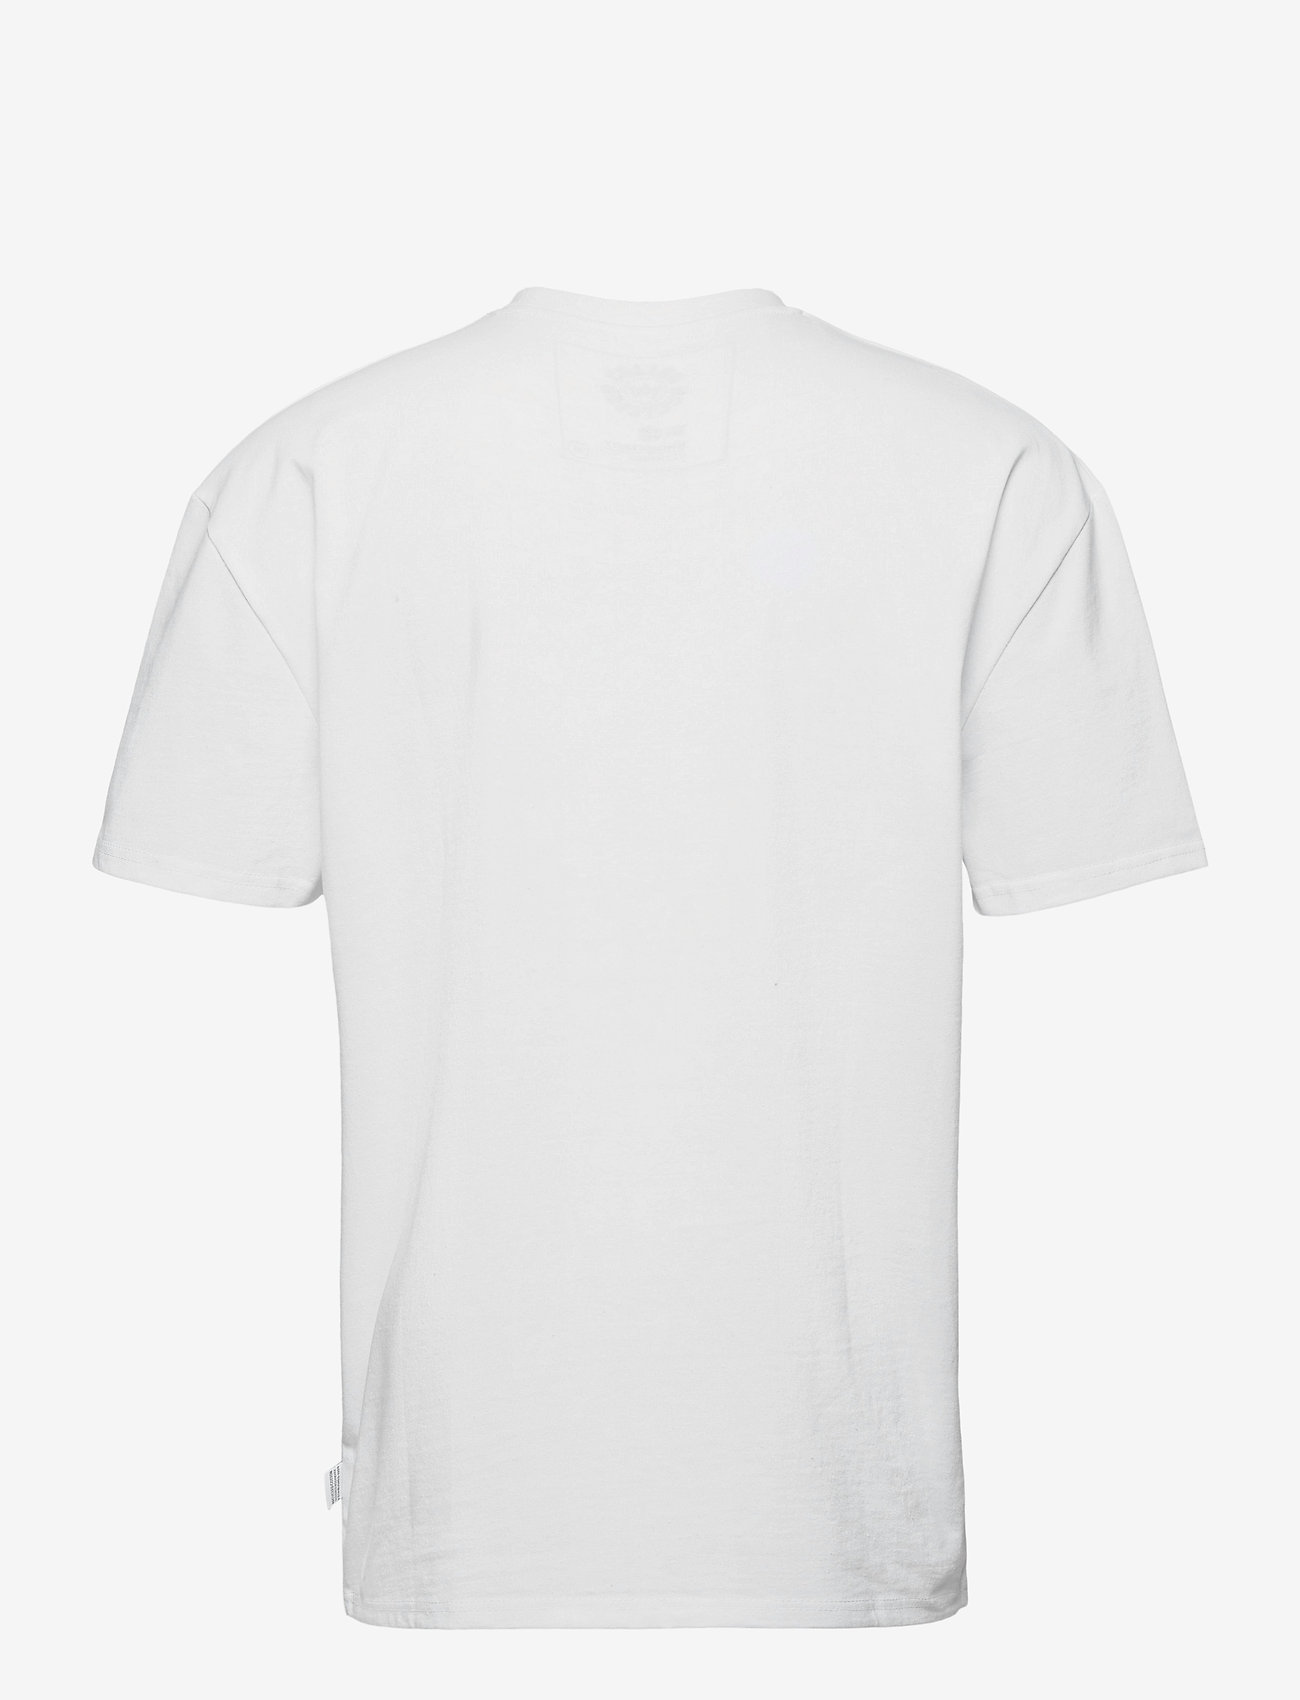 Kronstadt - Martin Recycled cotton boxfit t-shirt - t-shirts basiques - white - 1